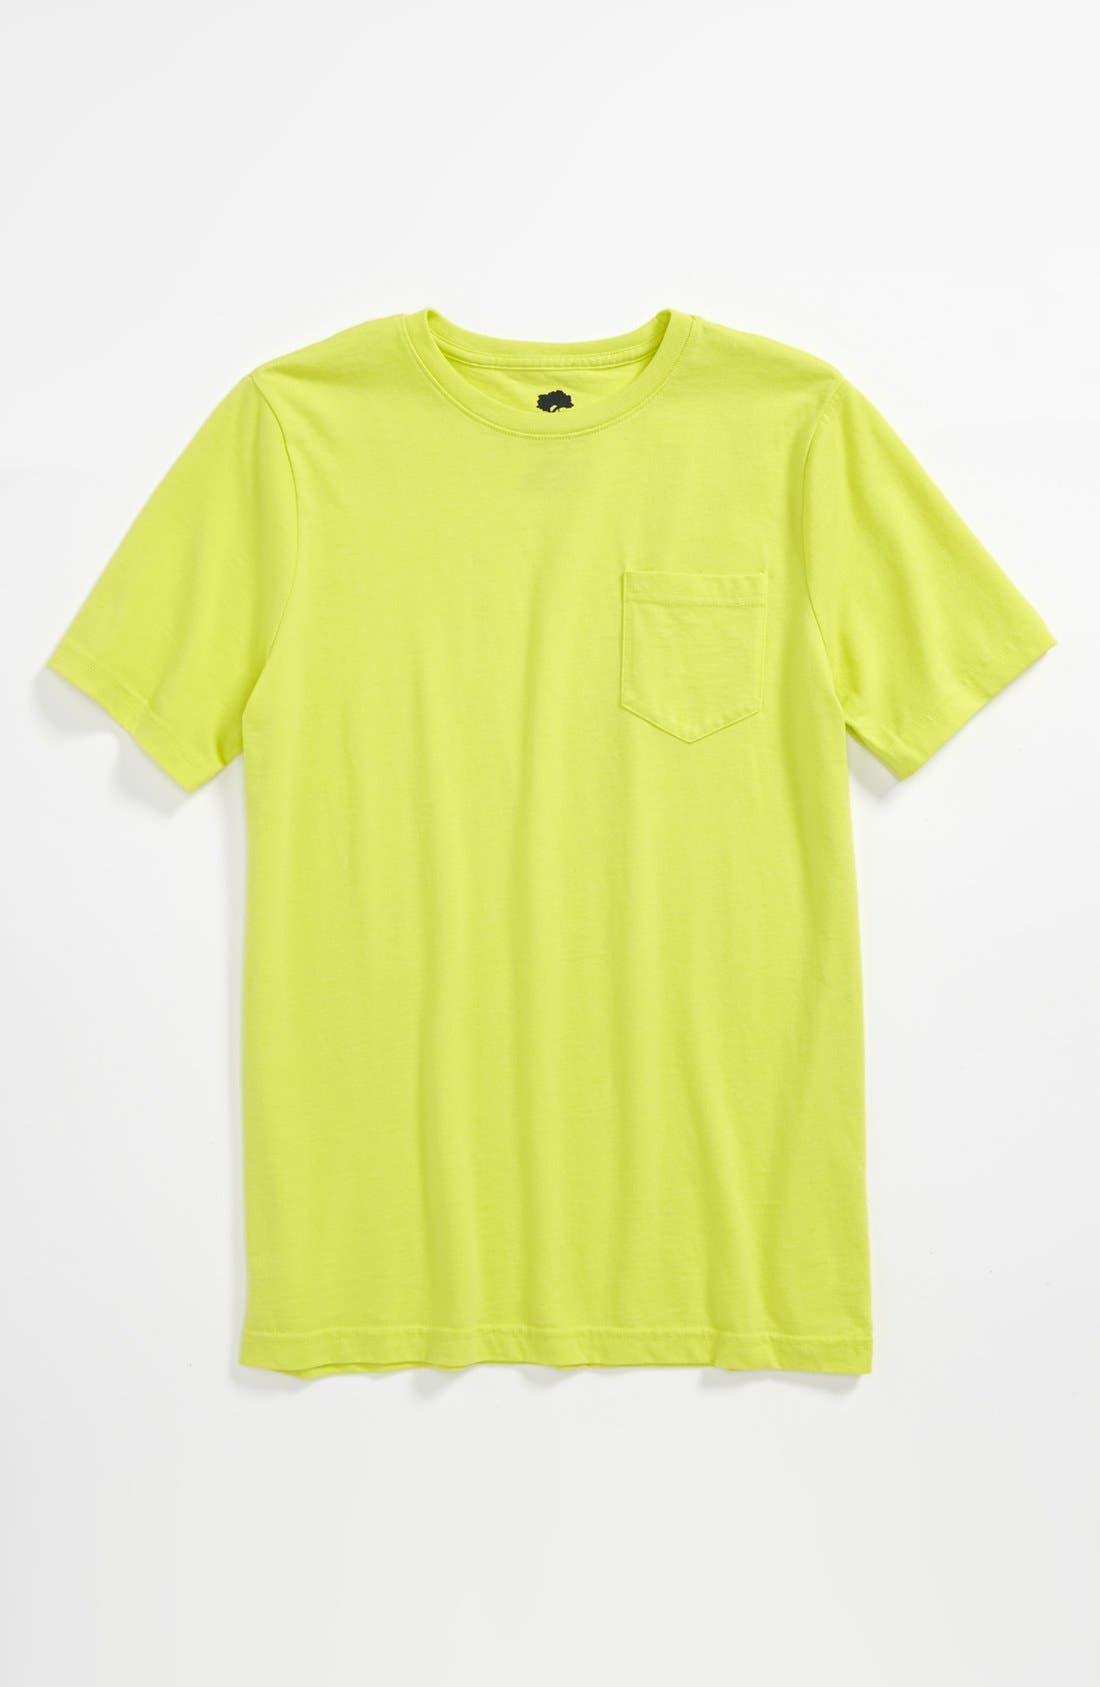 Main Image - Tucker + Tate 'Westlake' T-Shirt (Big Boys)